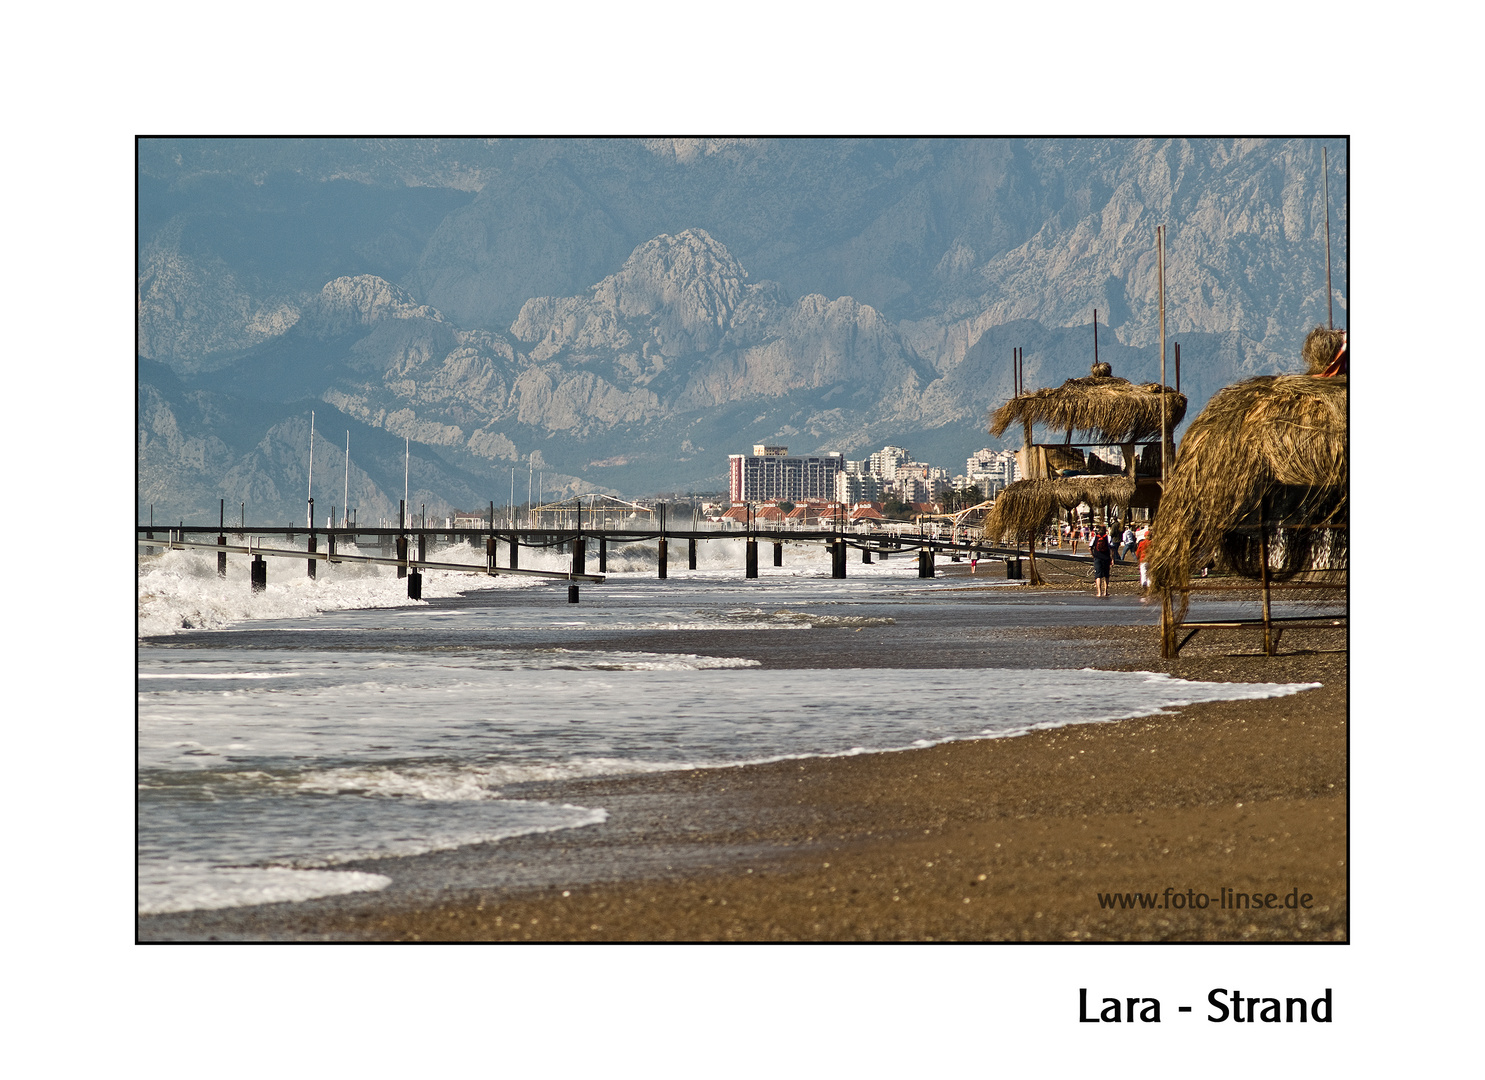 Lara - Strand